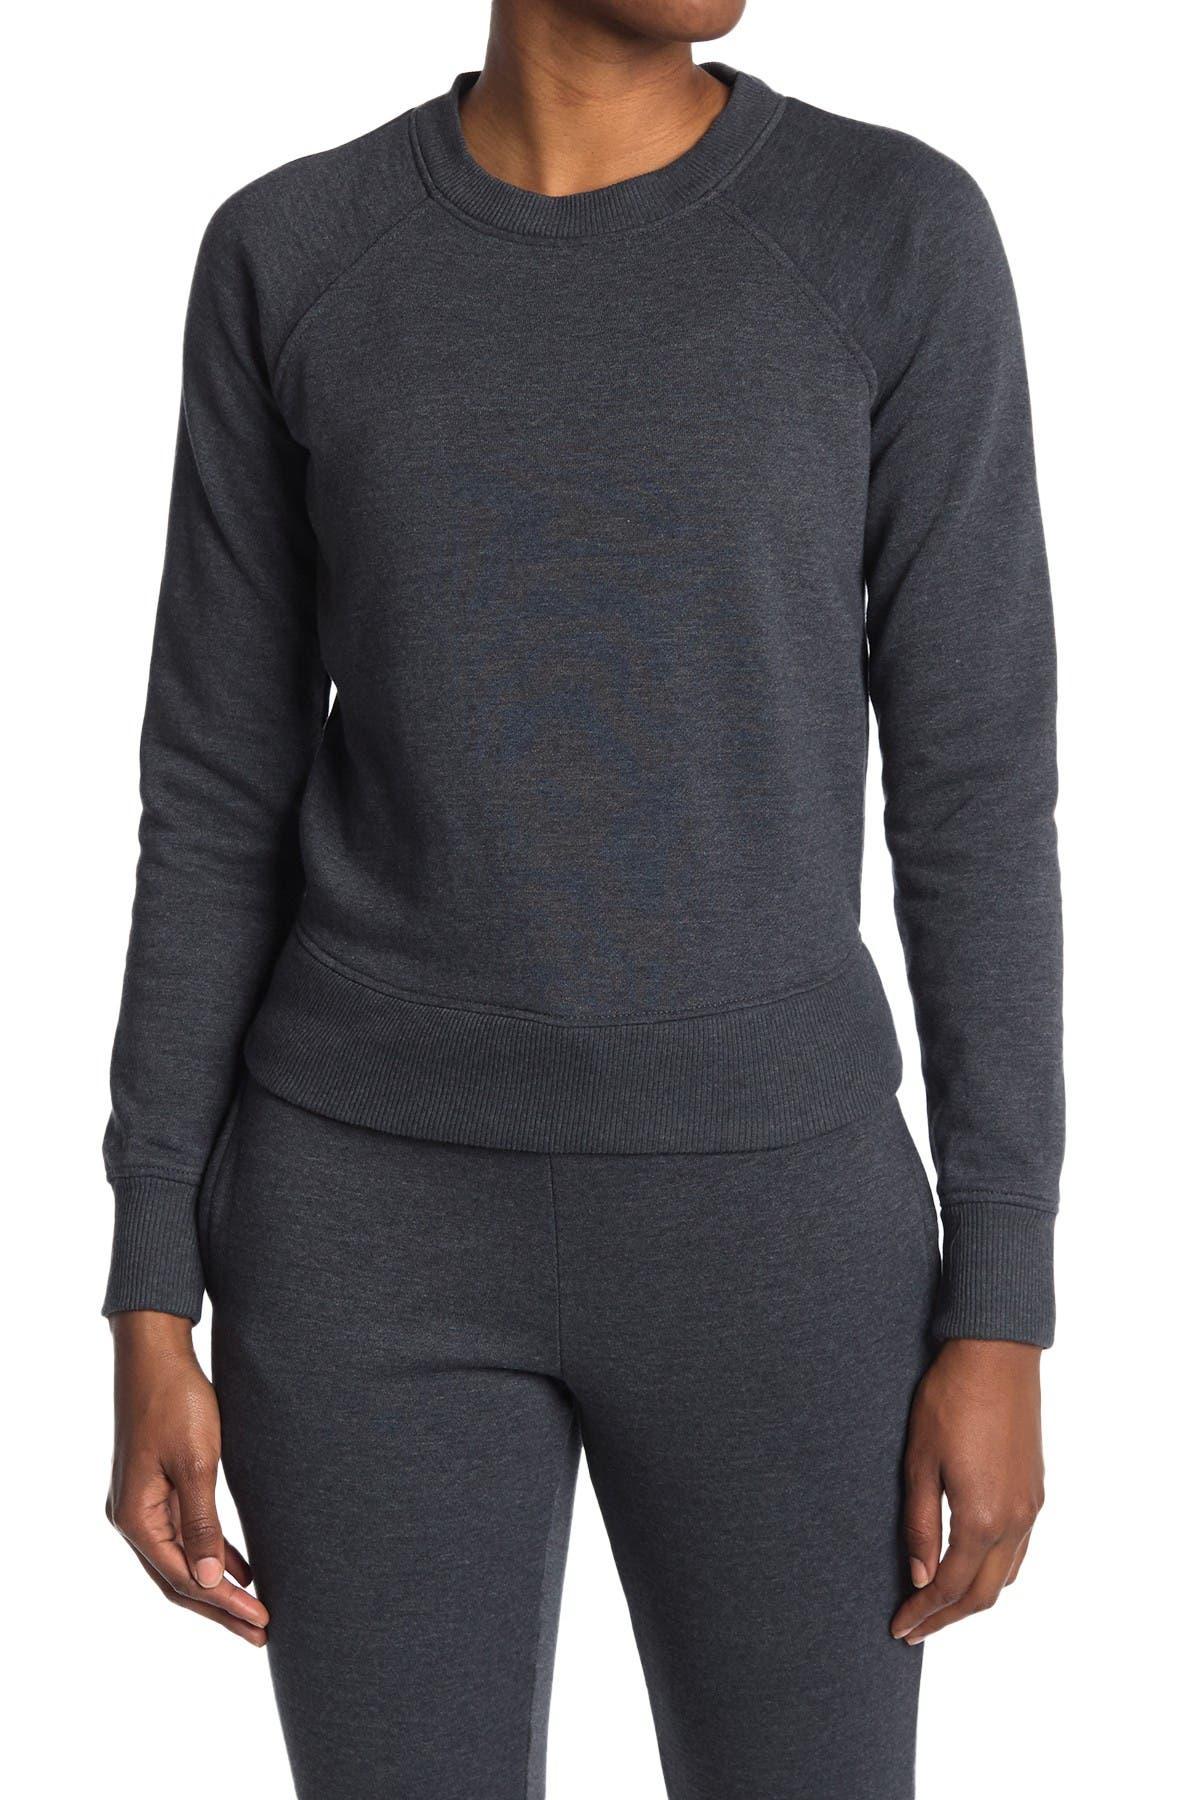 Image of 90 Degree By Reflex Stone Washed Sweatshirt